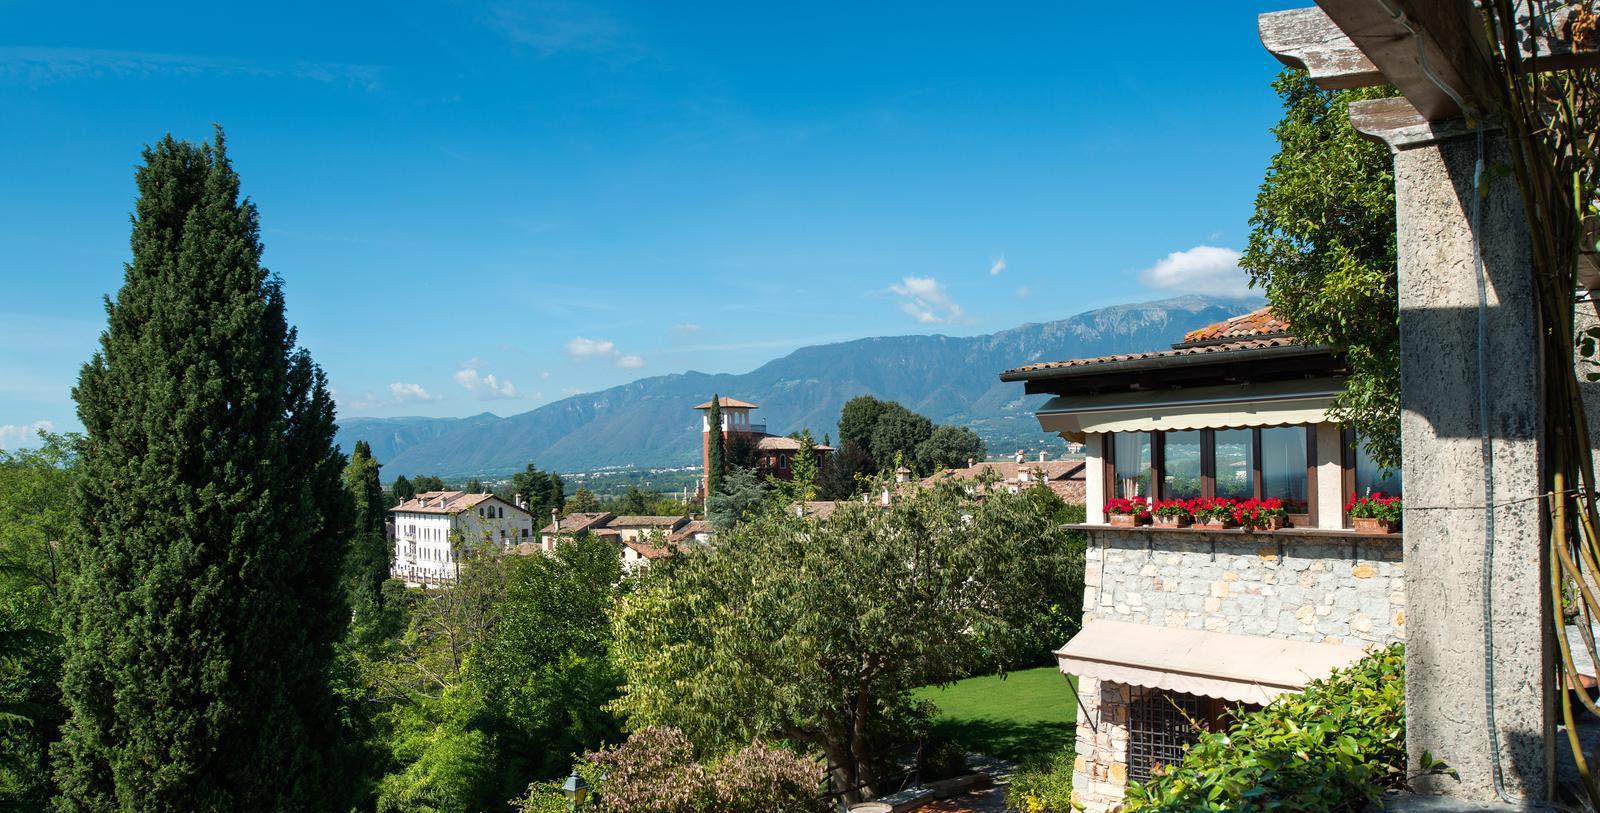 Daytime exterior of Hotel Villa Cipriani in Asolo, Italy.